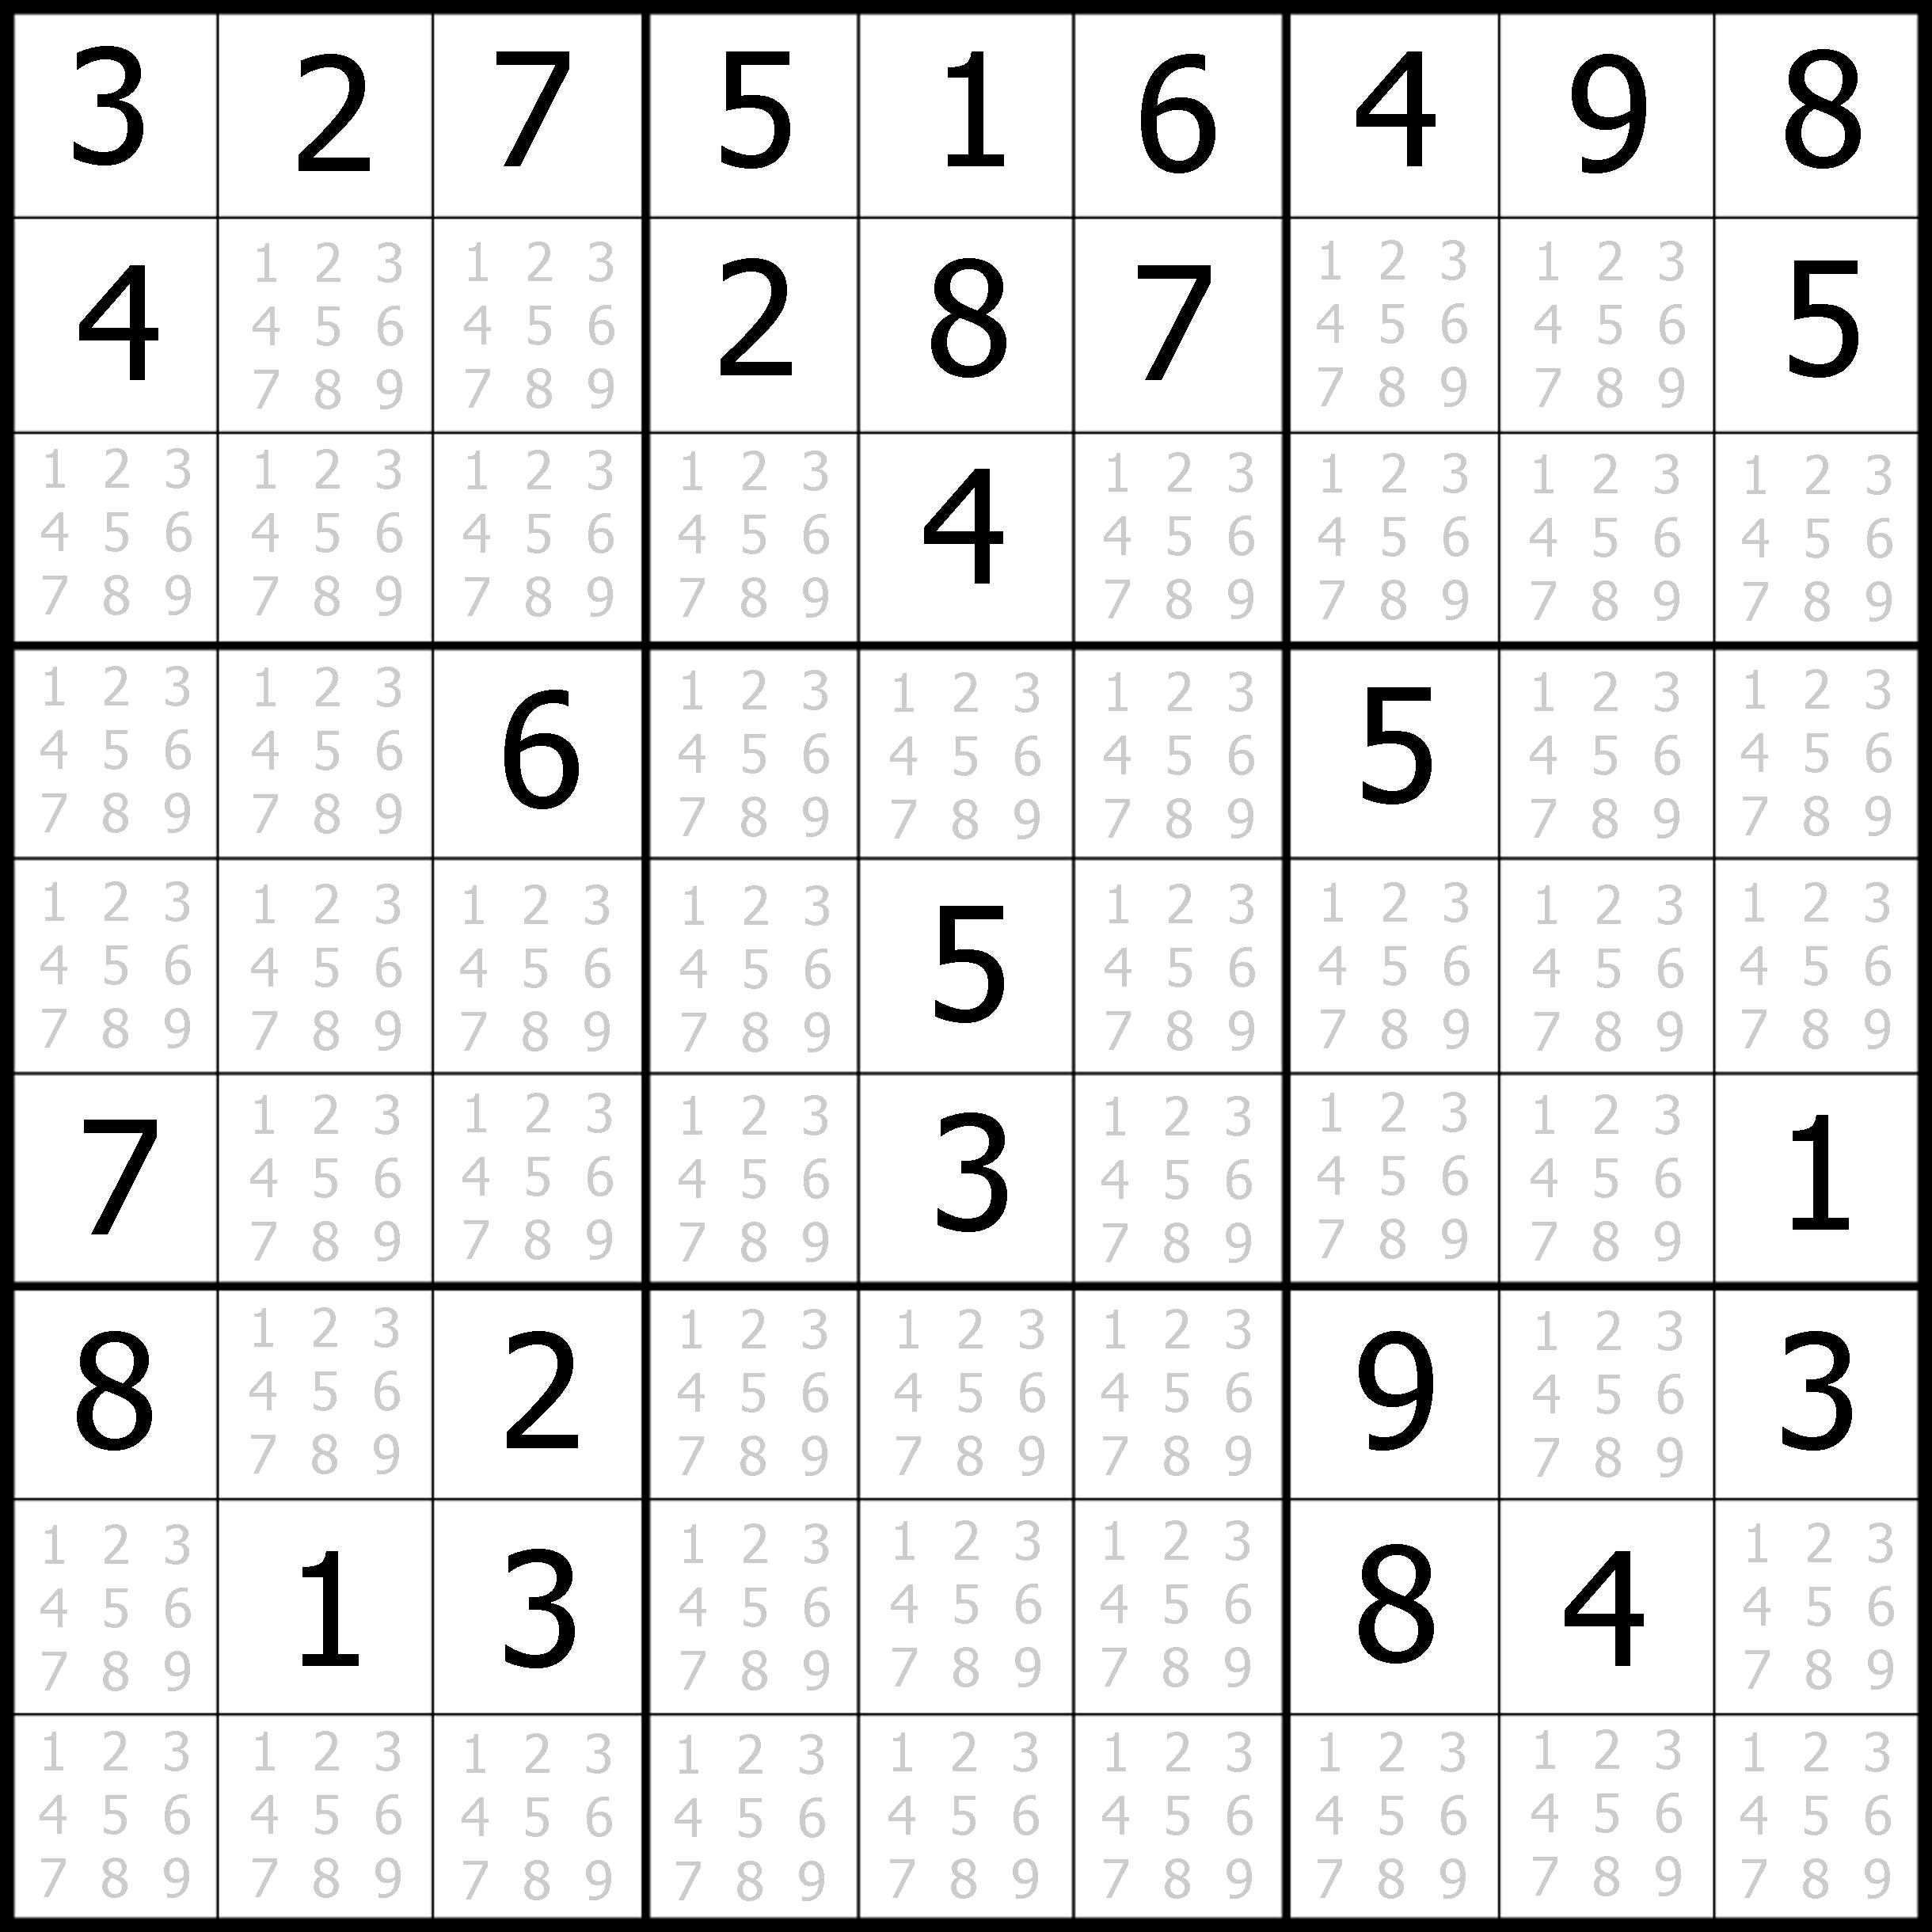 Free Printable Sudoku Puzzles For Kids Challenges For - Classy World - Free Printable Sudoku